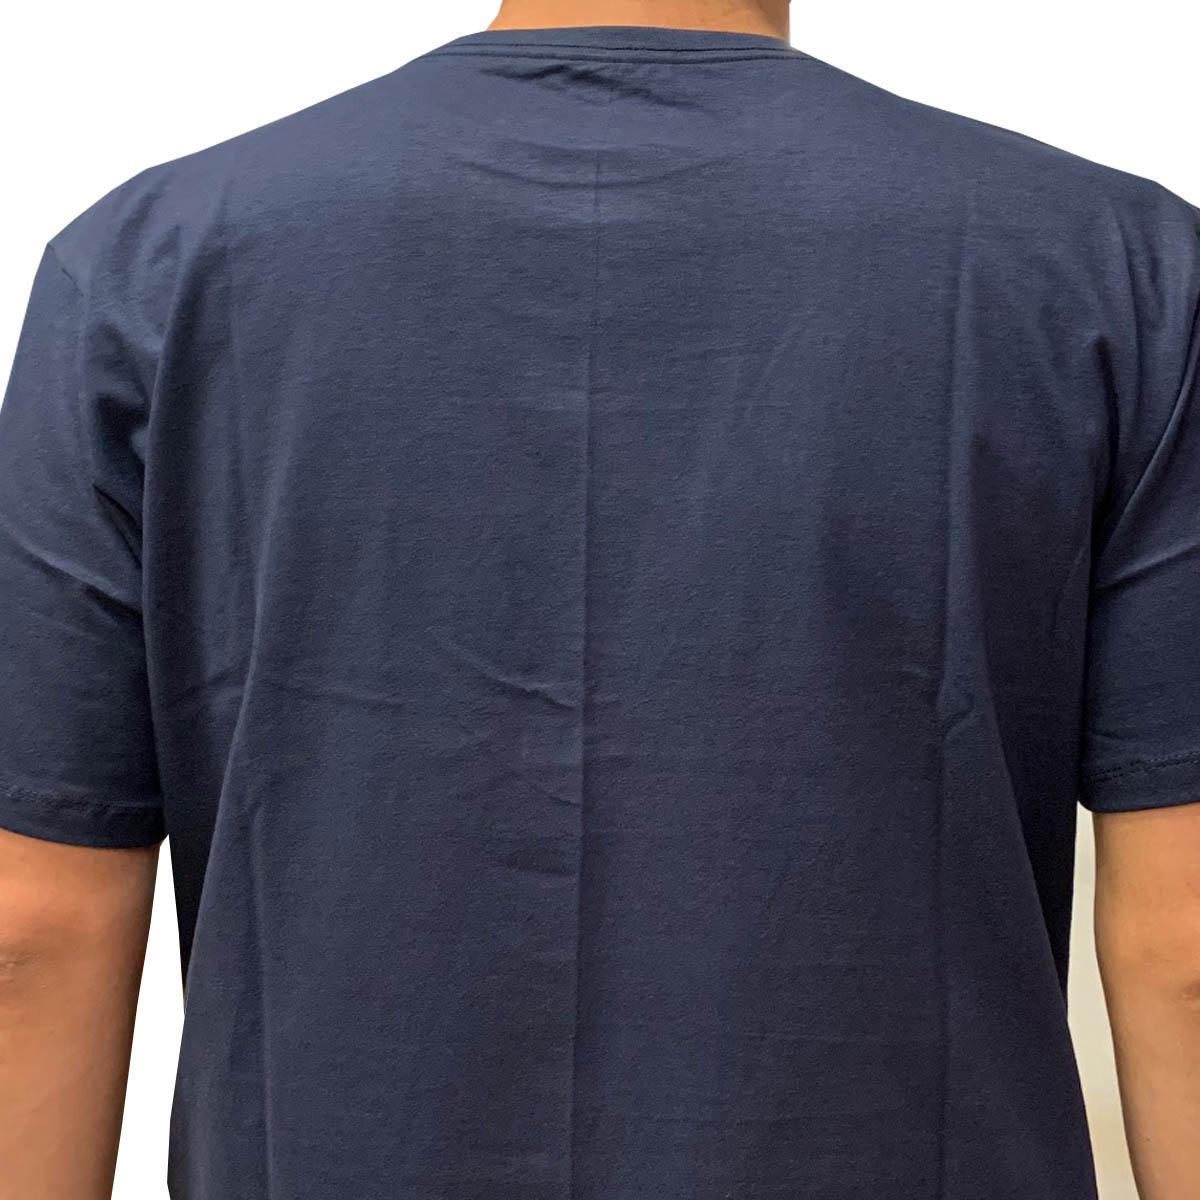 Camiseta Hurley Masculina Tamanhos Grandes